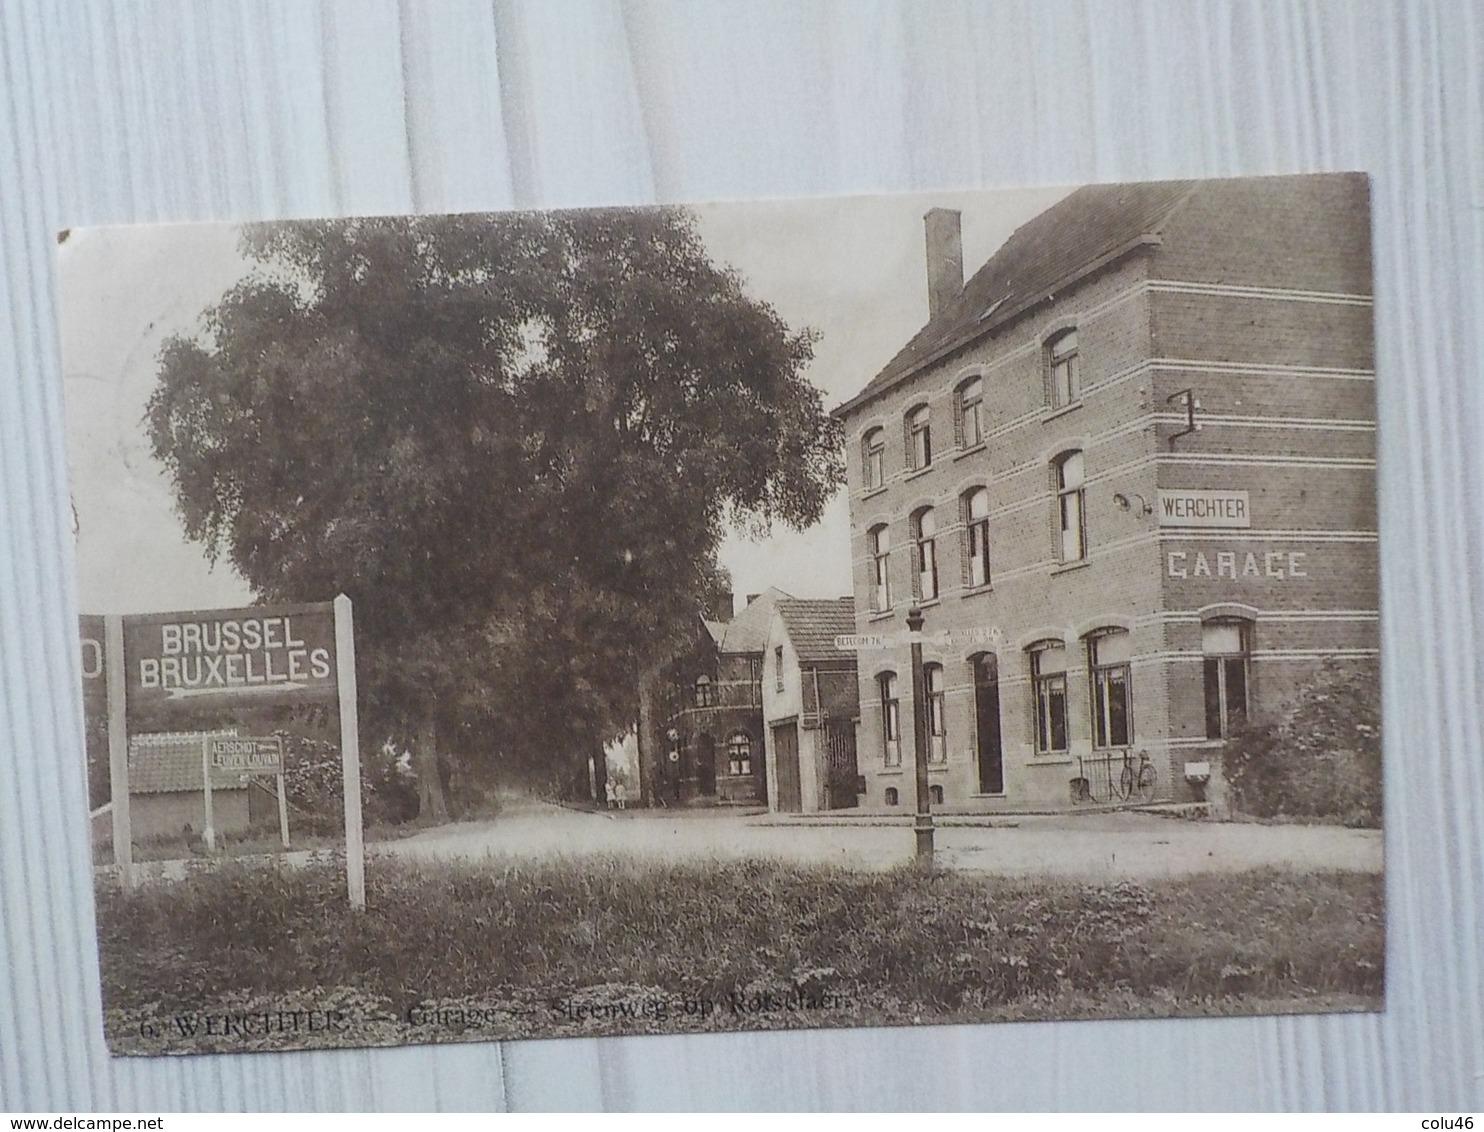 1922 Werchter Garage Steenweg Op Rotselaar Panneau Indicateur: Brussel - Rotselaar